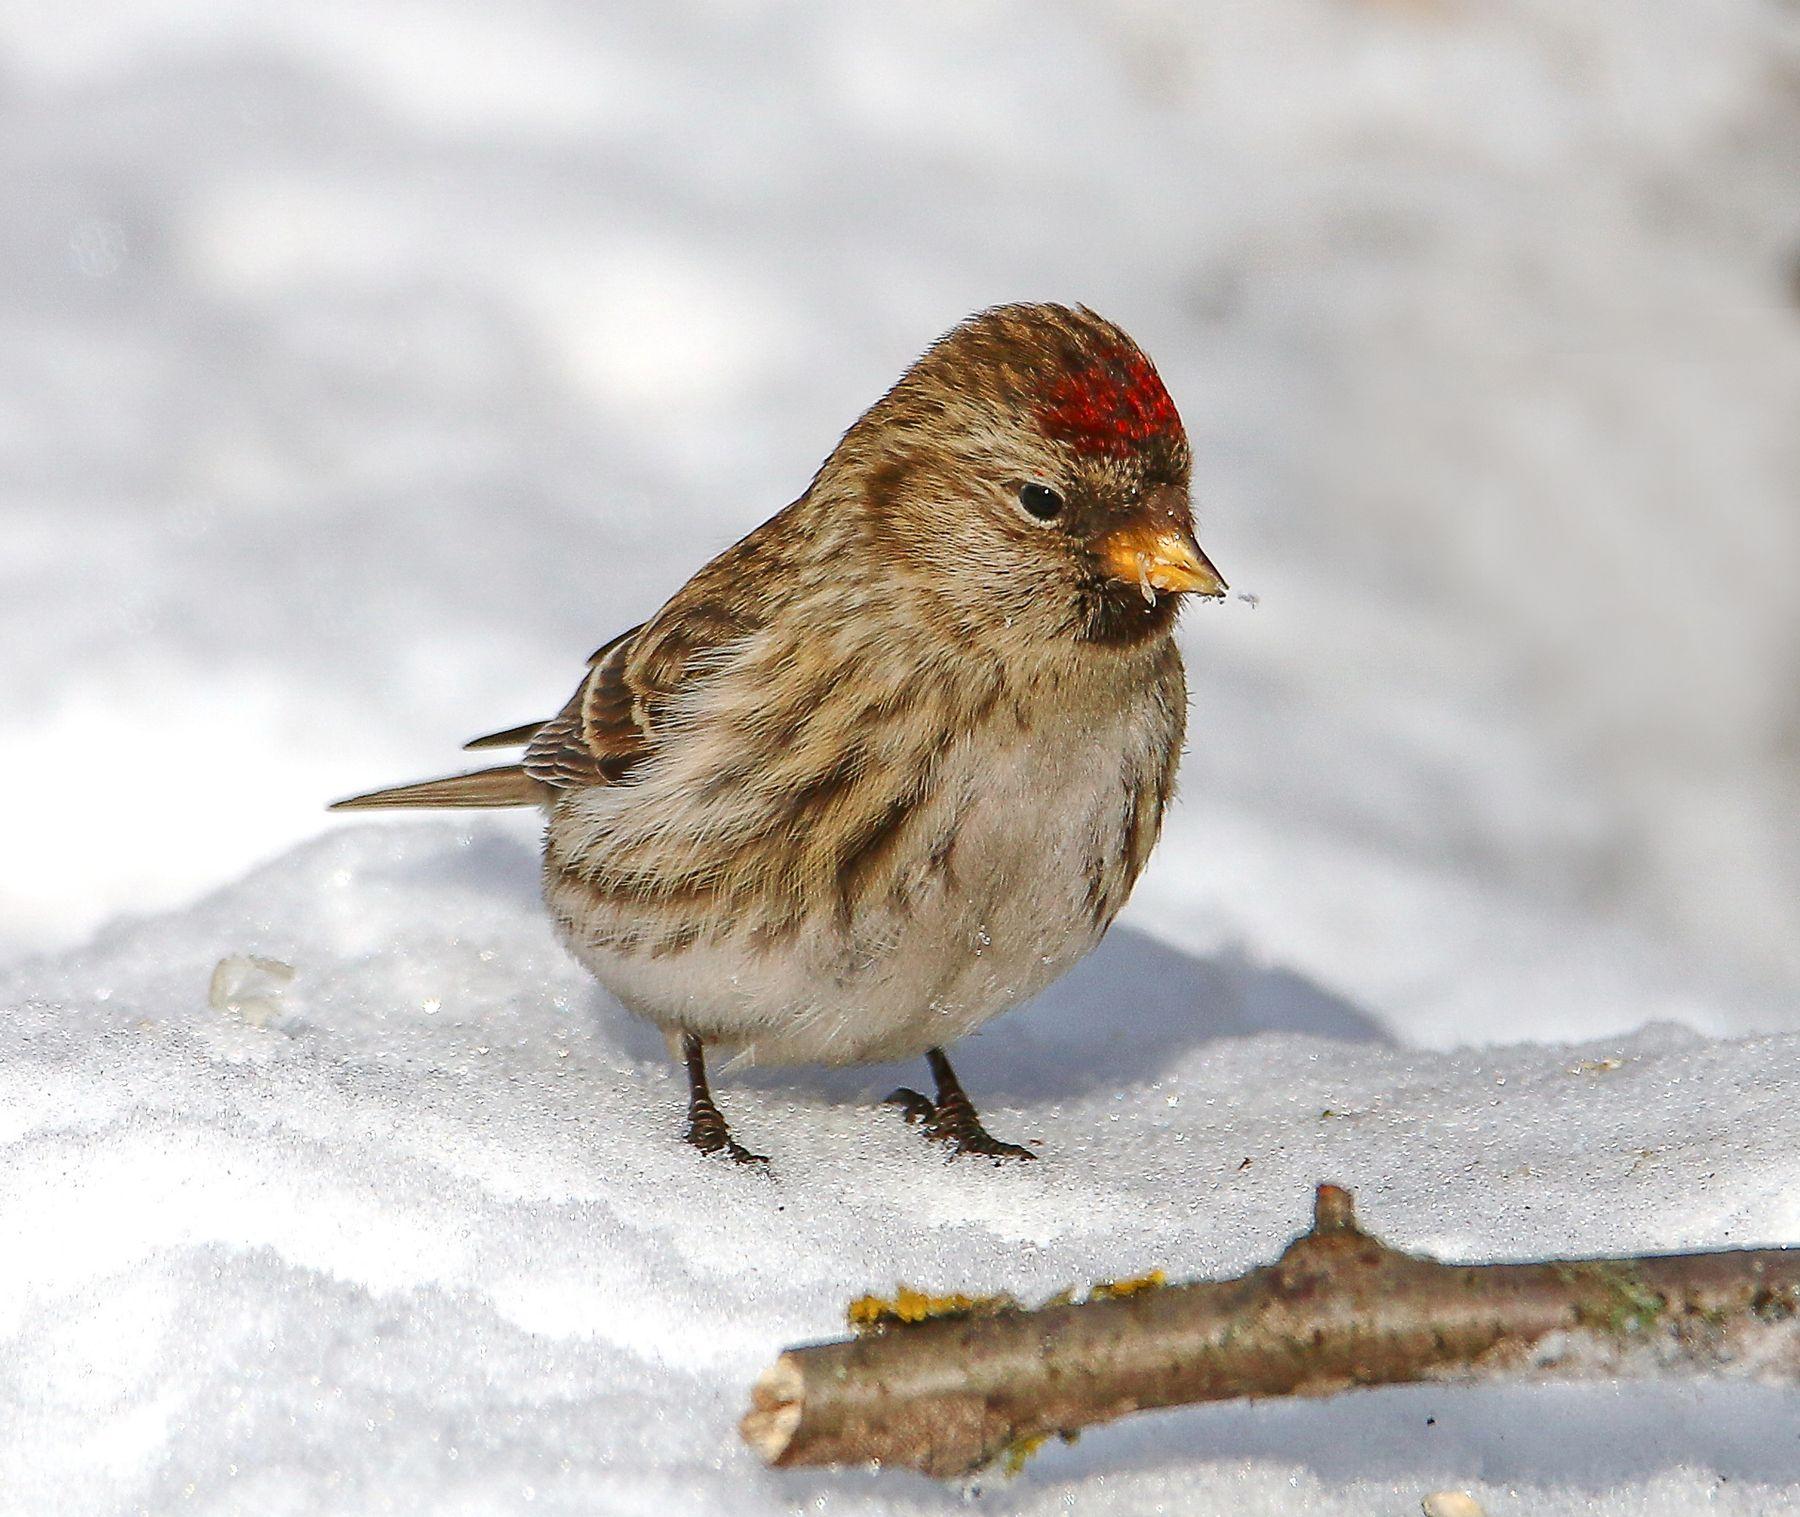 зима вернулась птицы чечетки снег зима